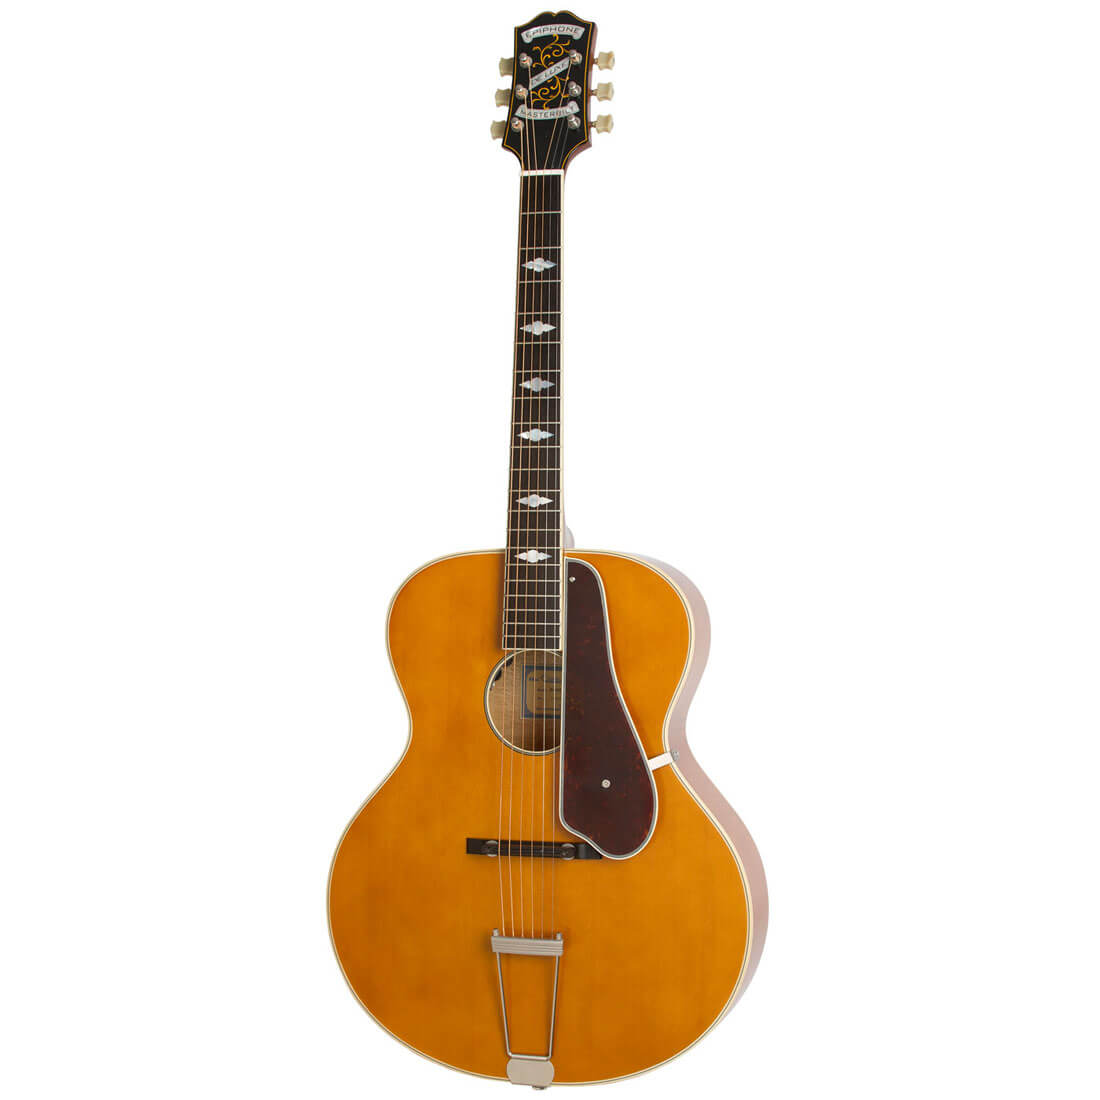 Image of   Epiphone Masterbilt De Luxe (Round hole) western-guitar vintage sunburst